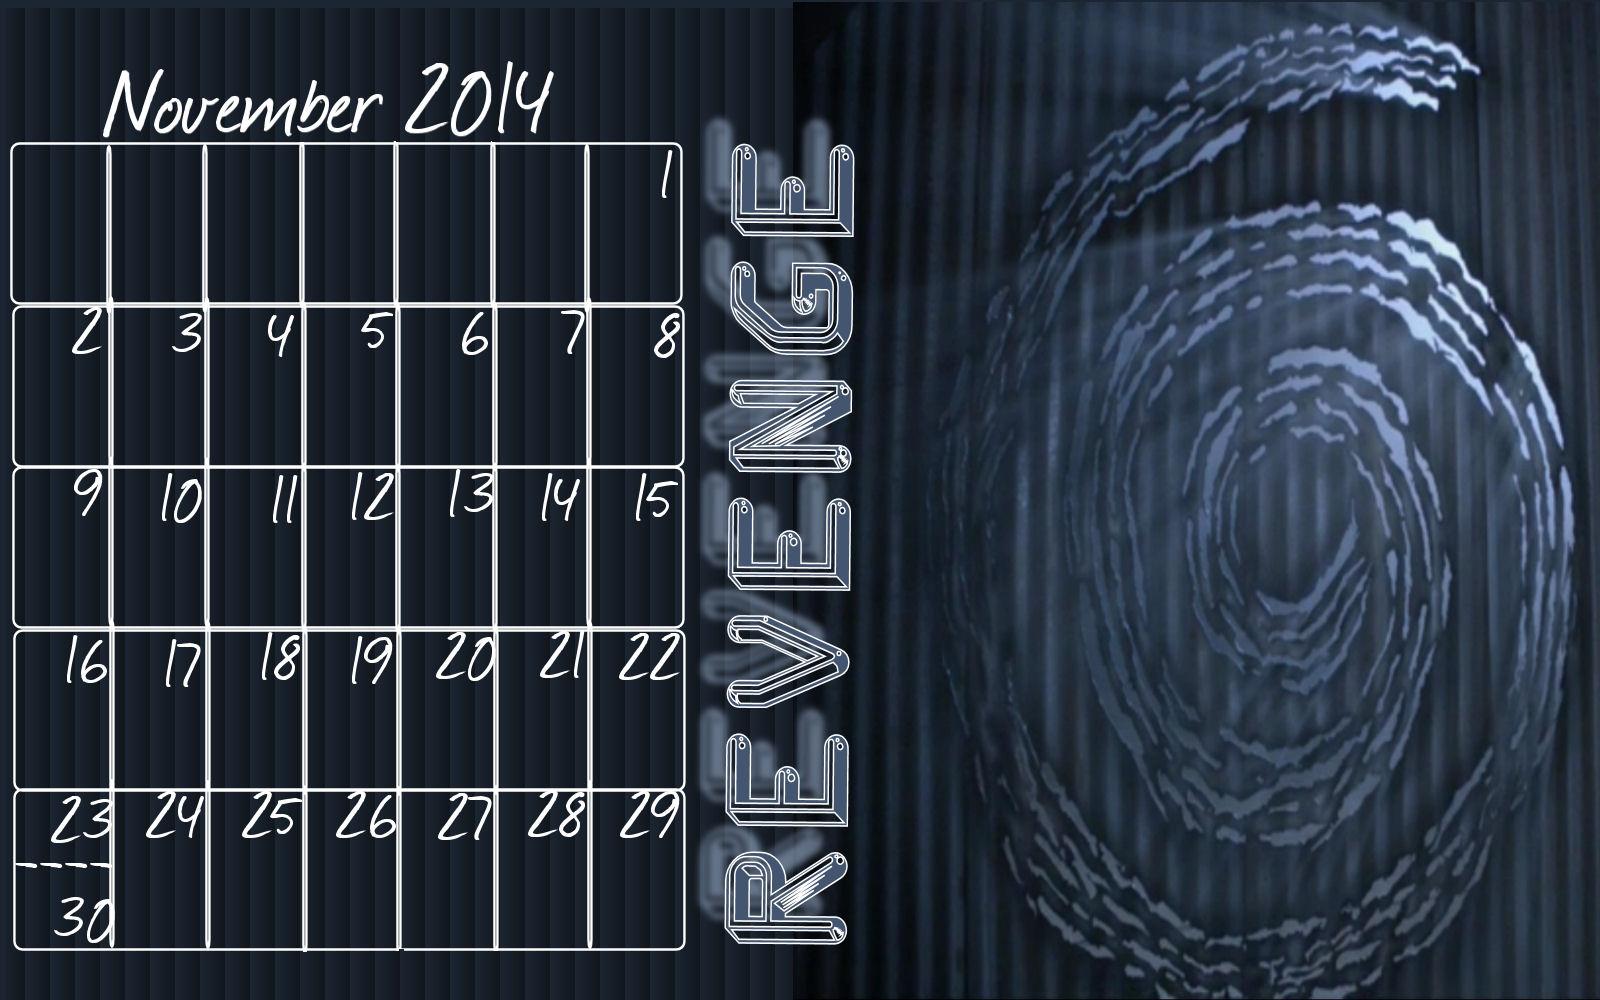 11. TW Nov